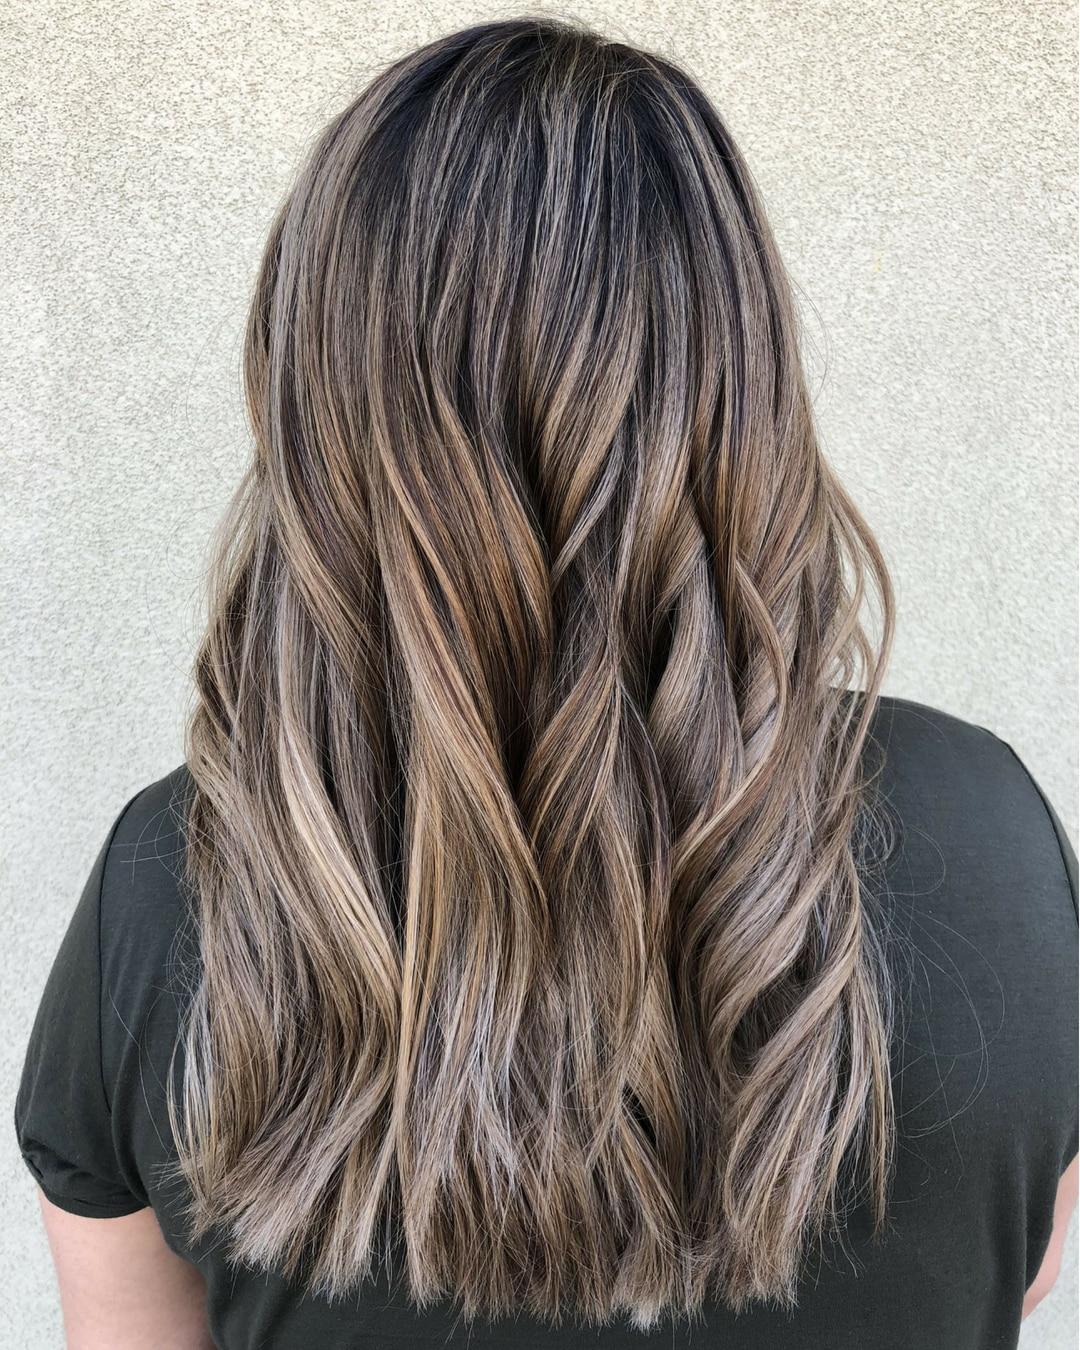 Best Hairstyles for Women in 2018 - 100+ Trending Ideas